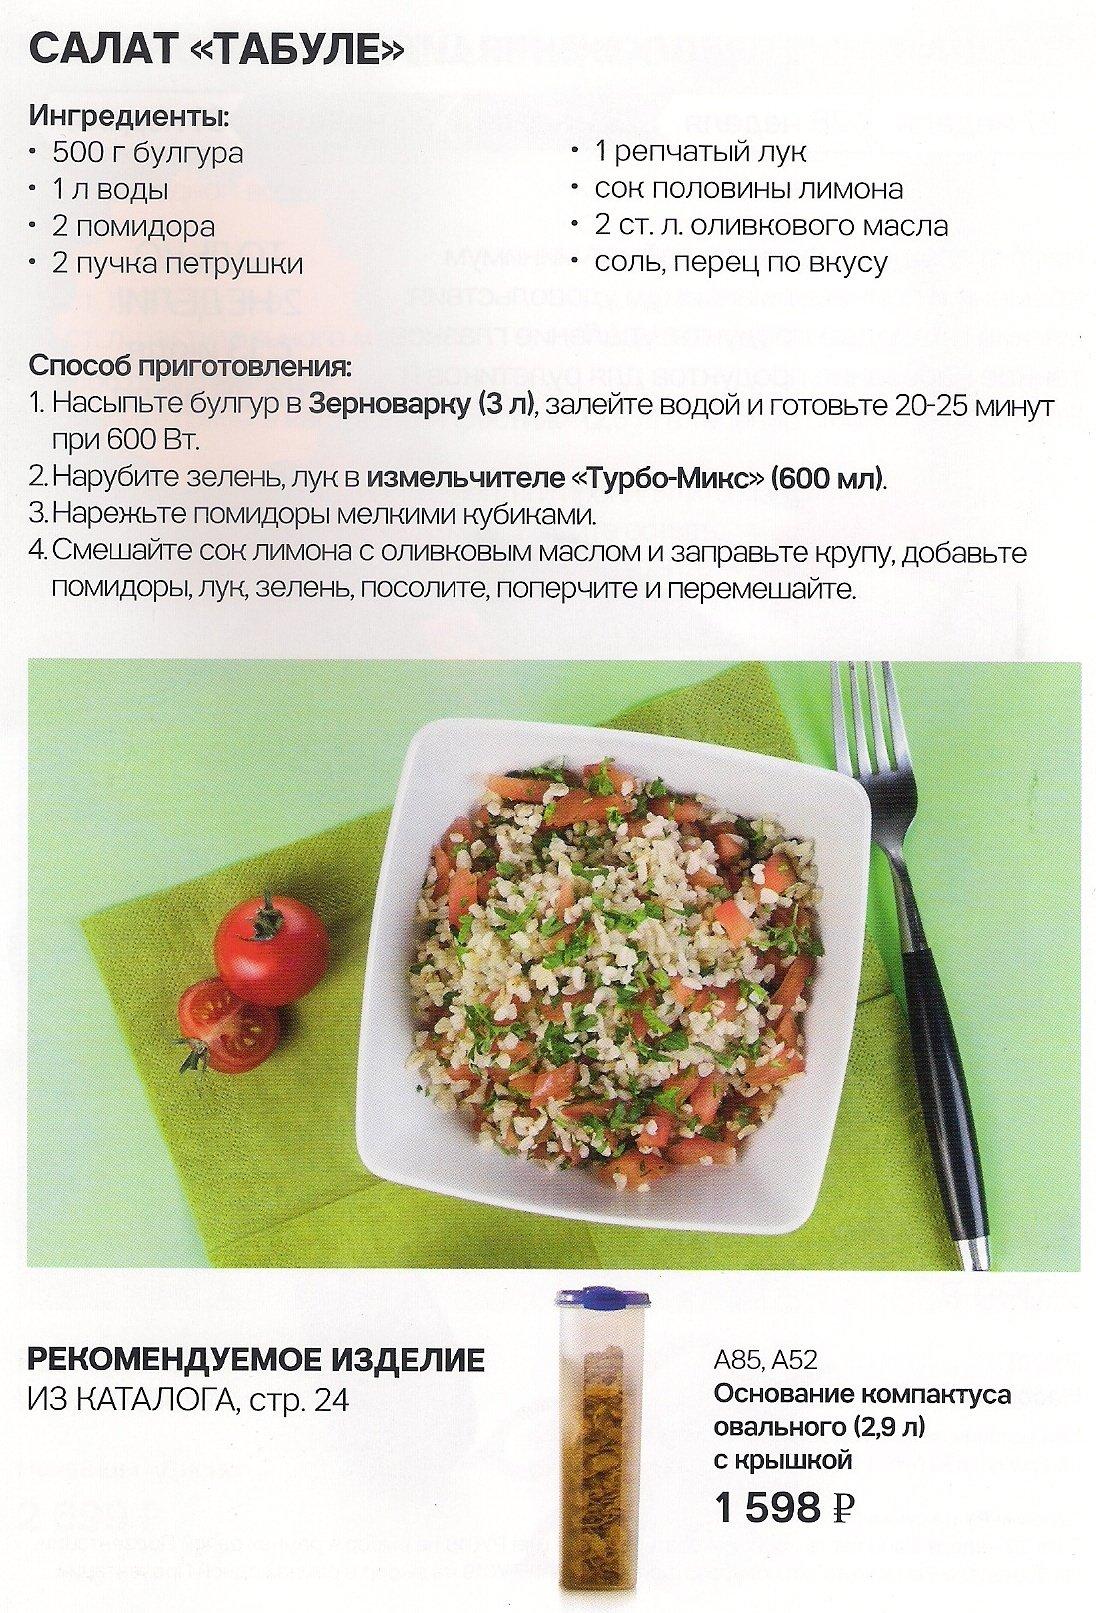 http://tupperware-online.ru/images/upload/11a.jpg